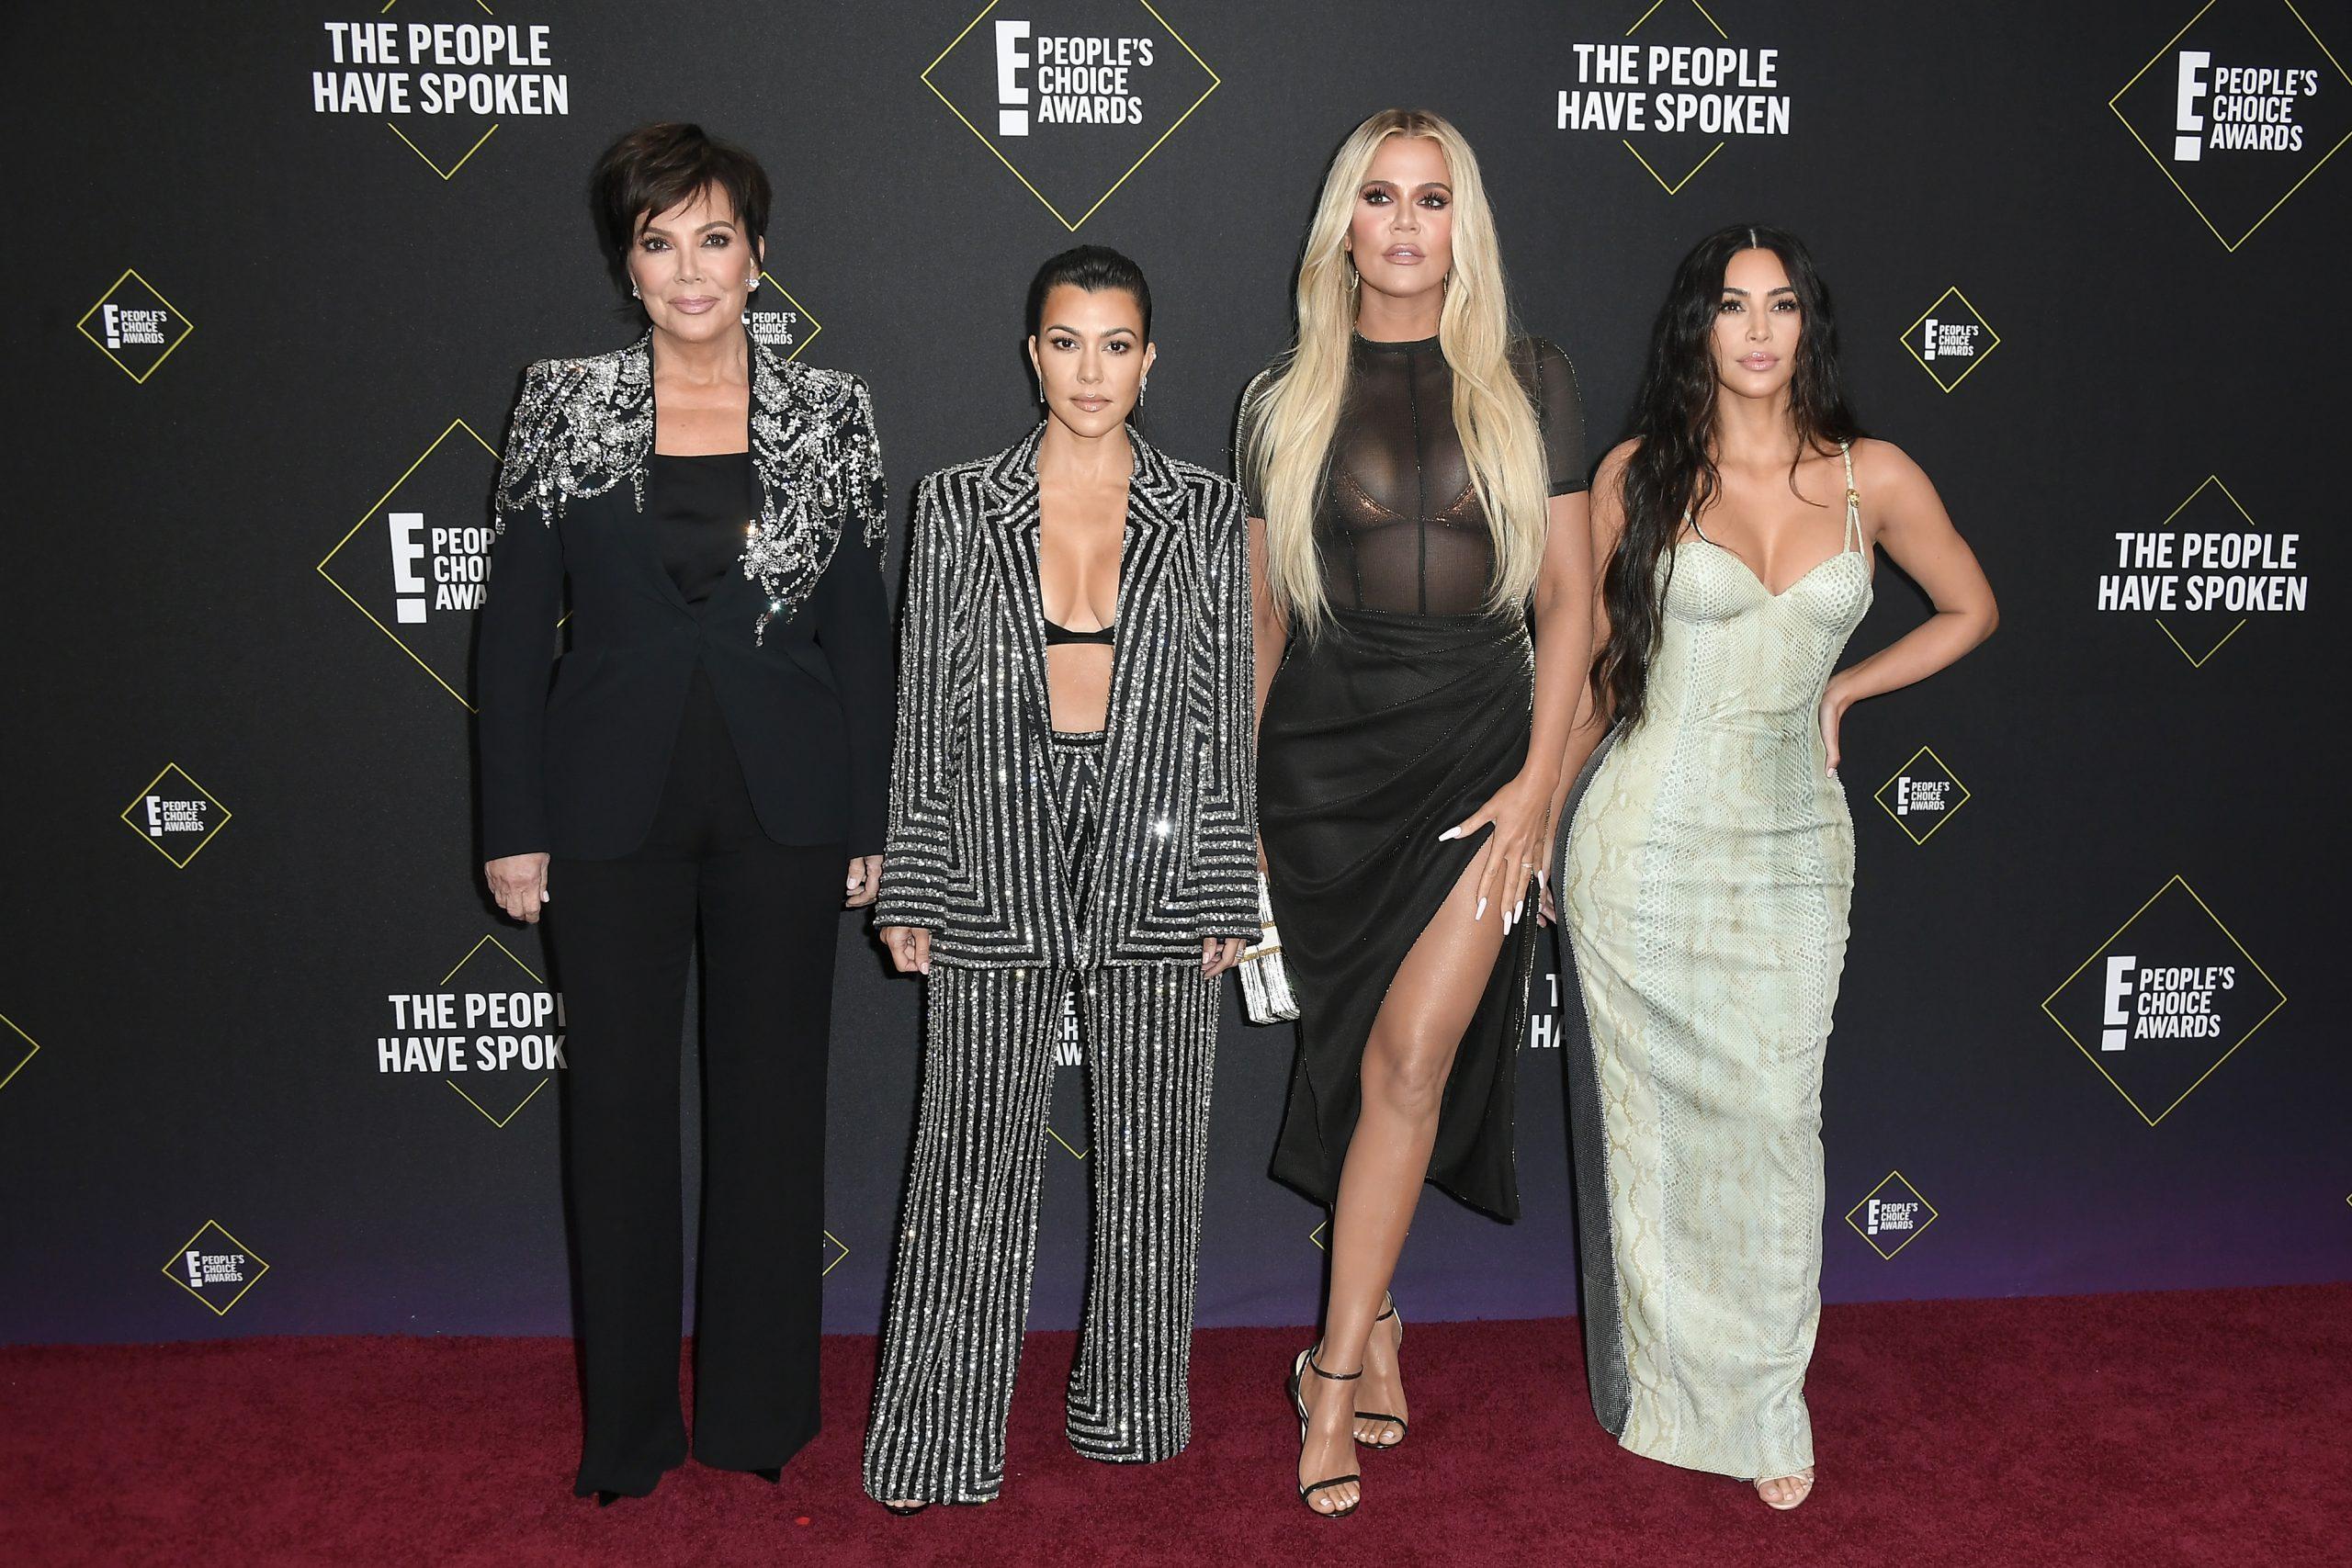 Kardashian sisters and Kris Jenner